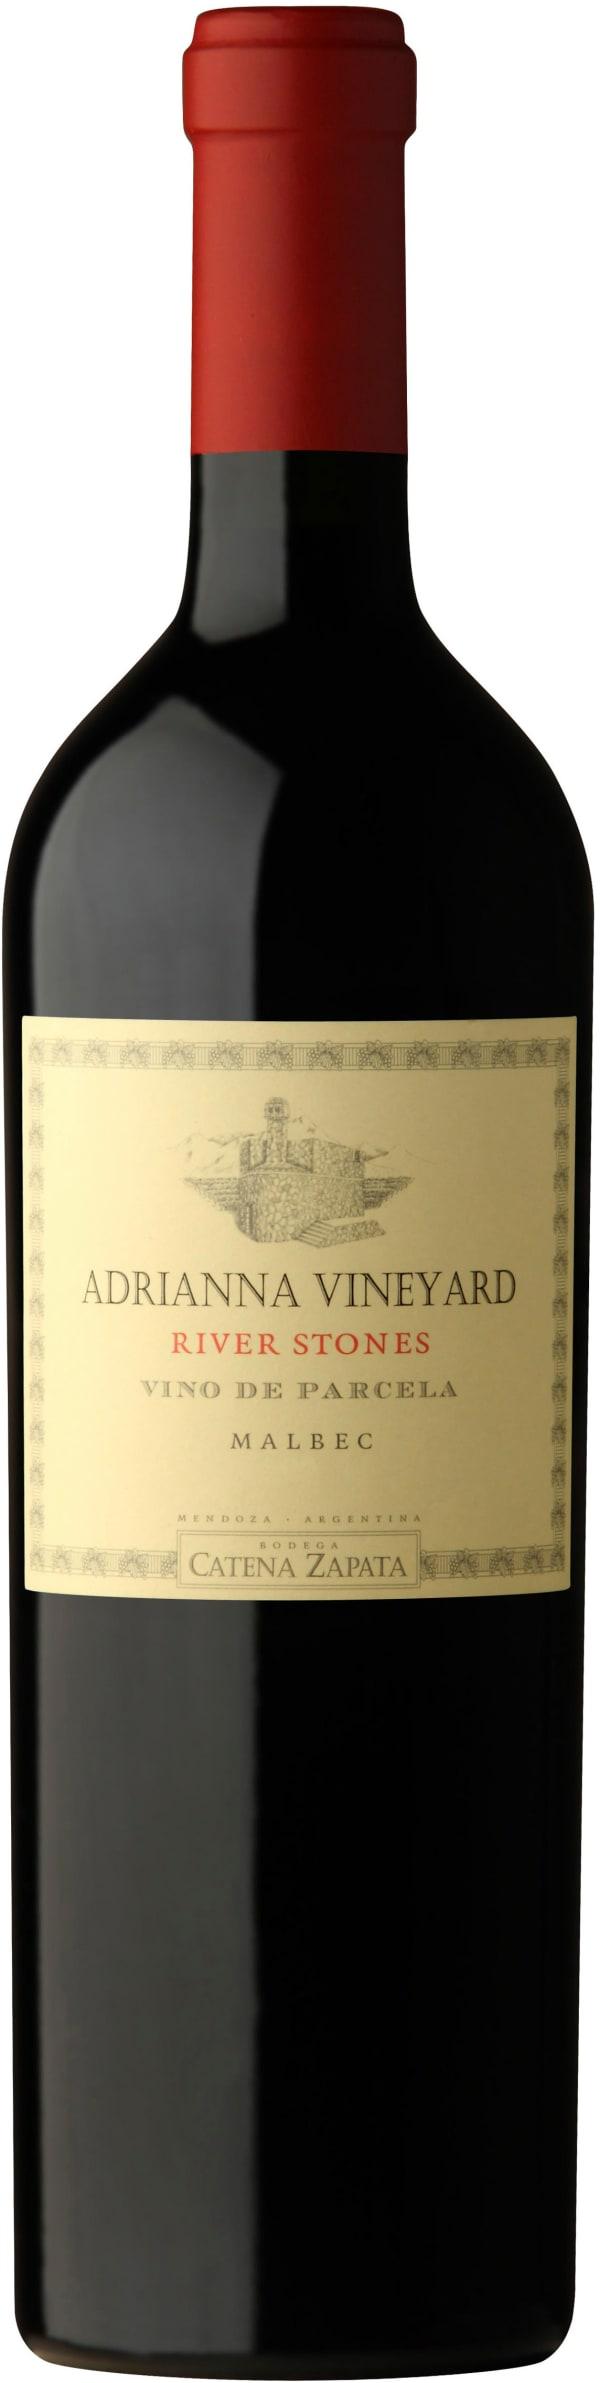 Adrianna Vineyard River Stones Malbec 2017